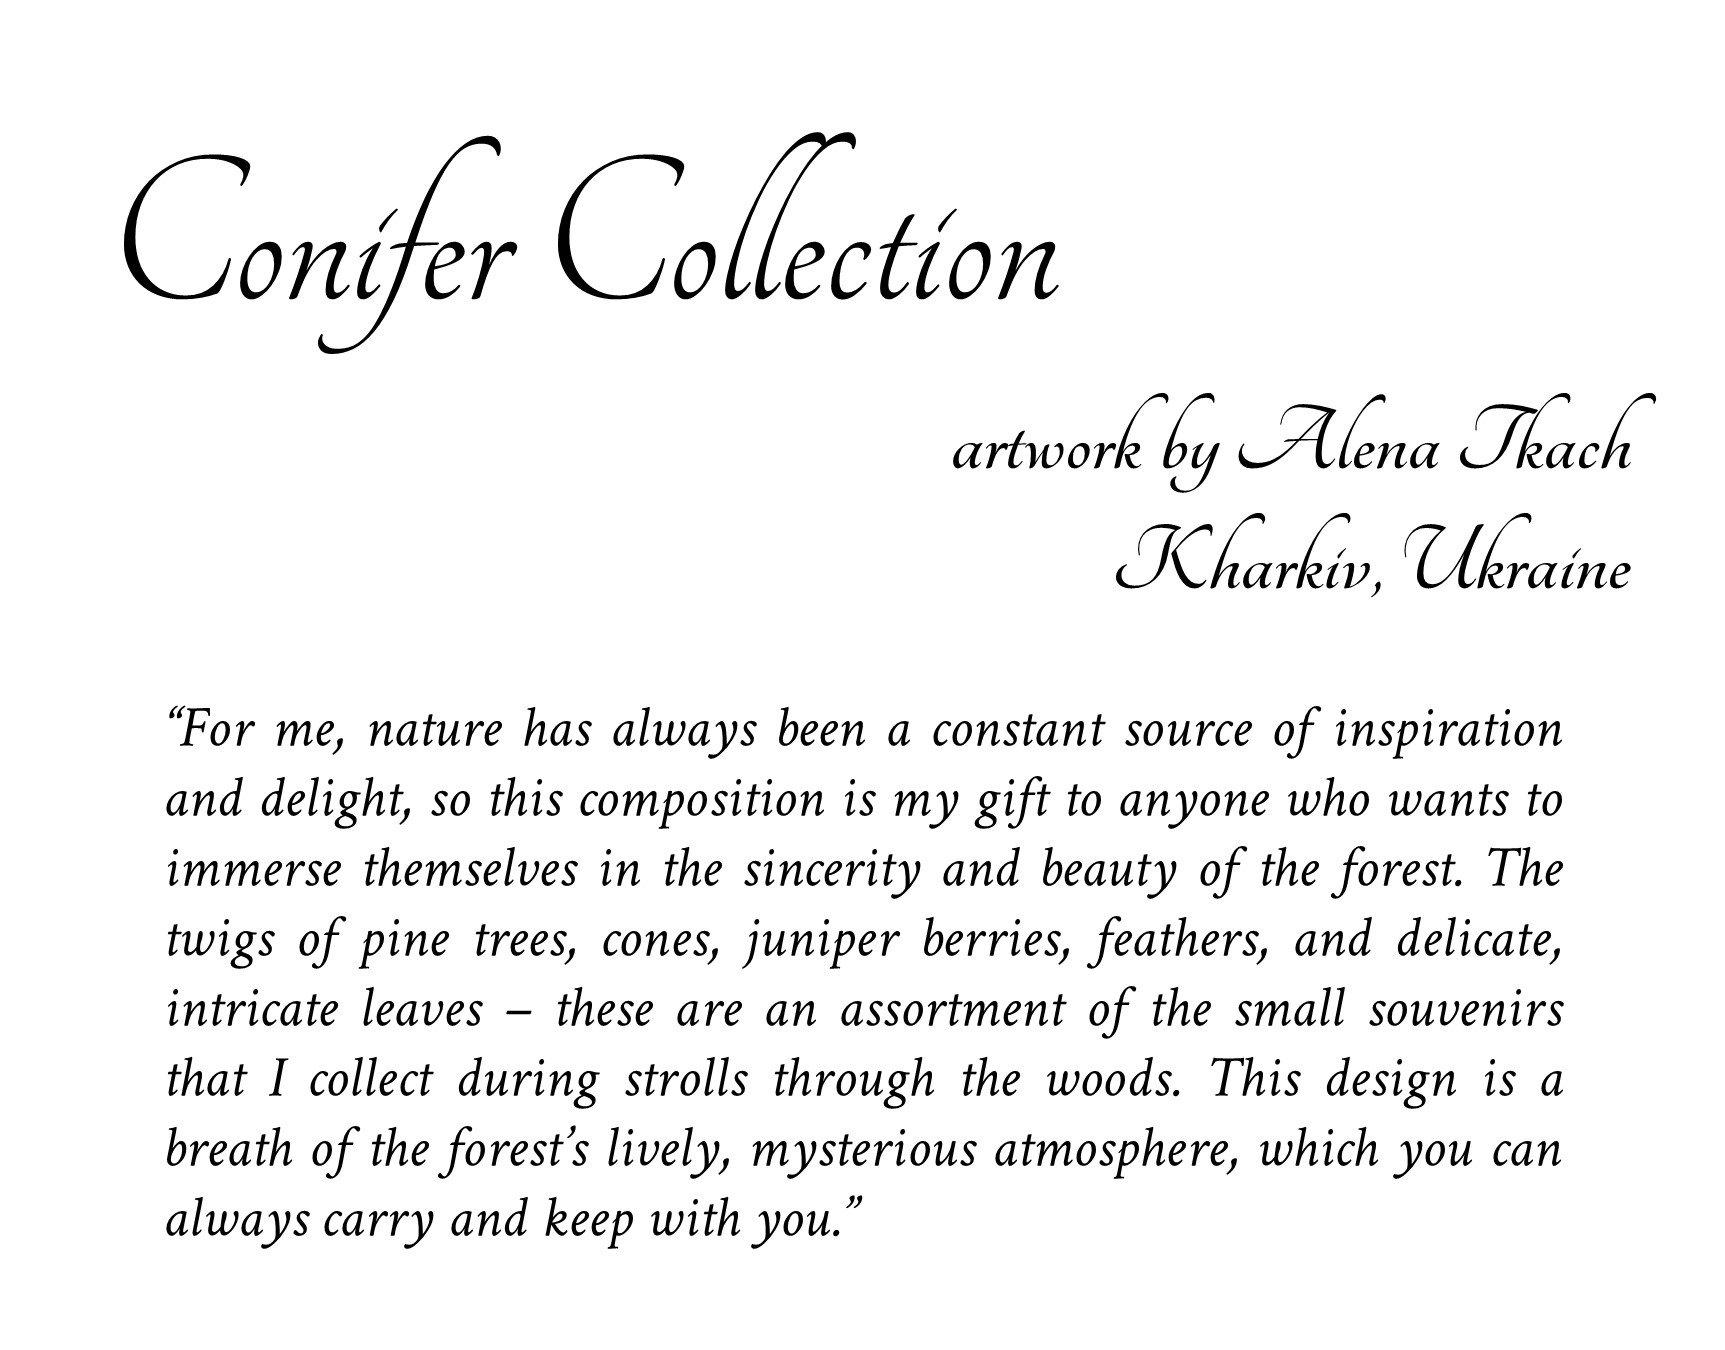 R. Culturi Made in Italy 100% Silk Pocket Square Original Artwork (Orange/Plum) Gift Box